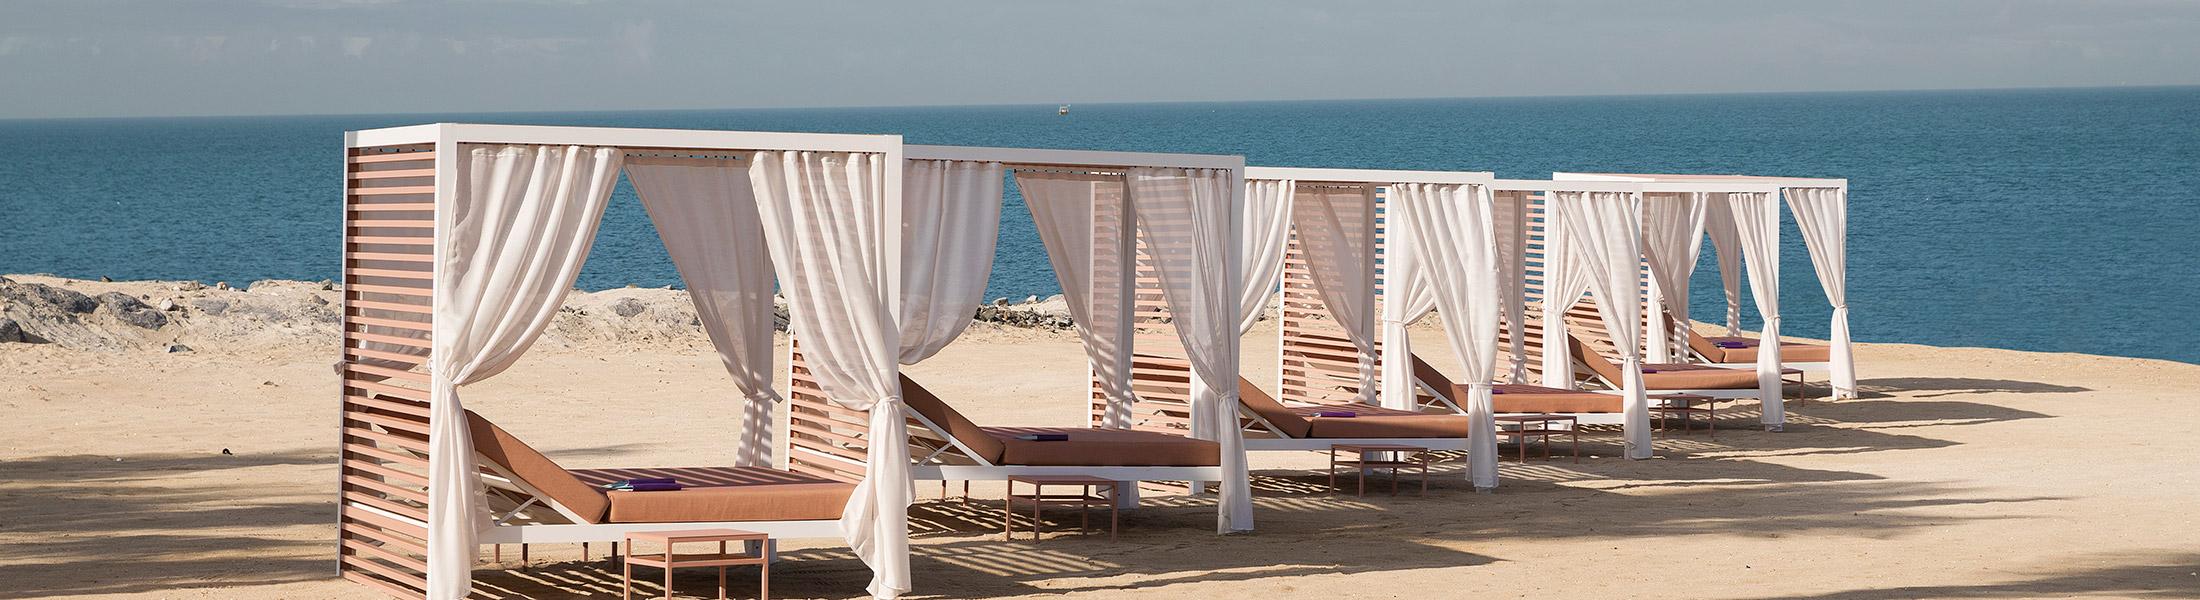 Beach cabanas at Caesars Palace Bluewaters